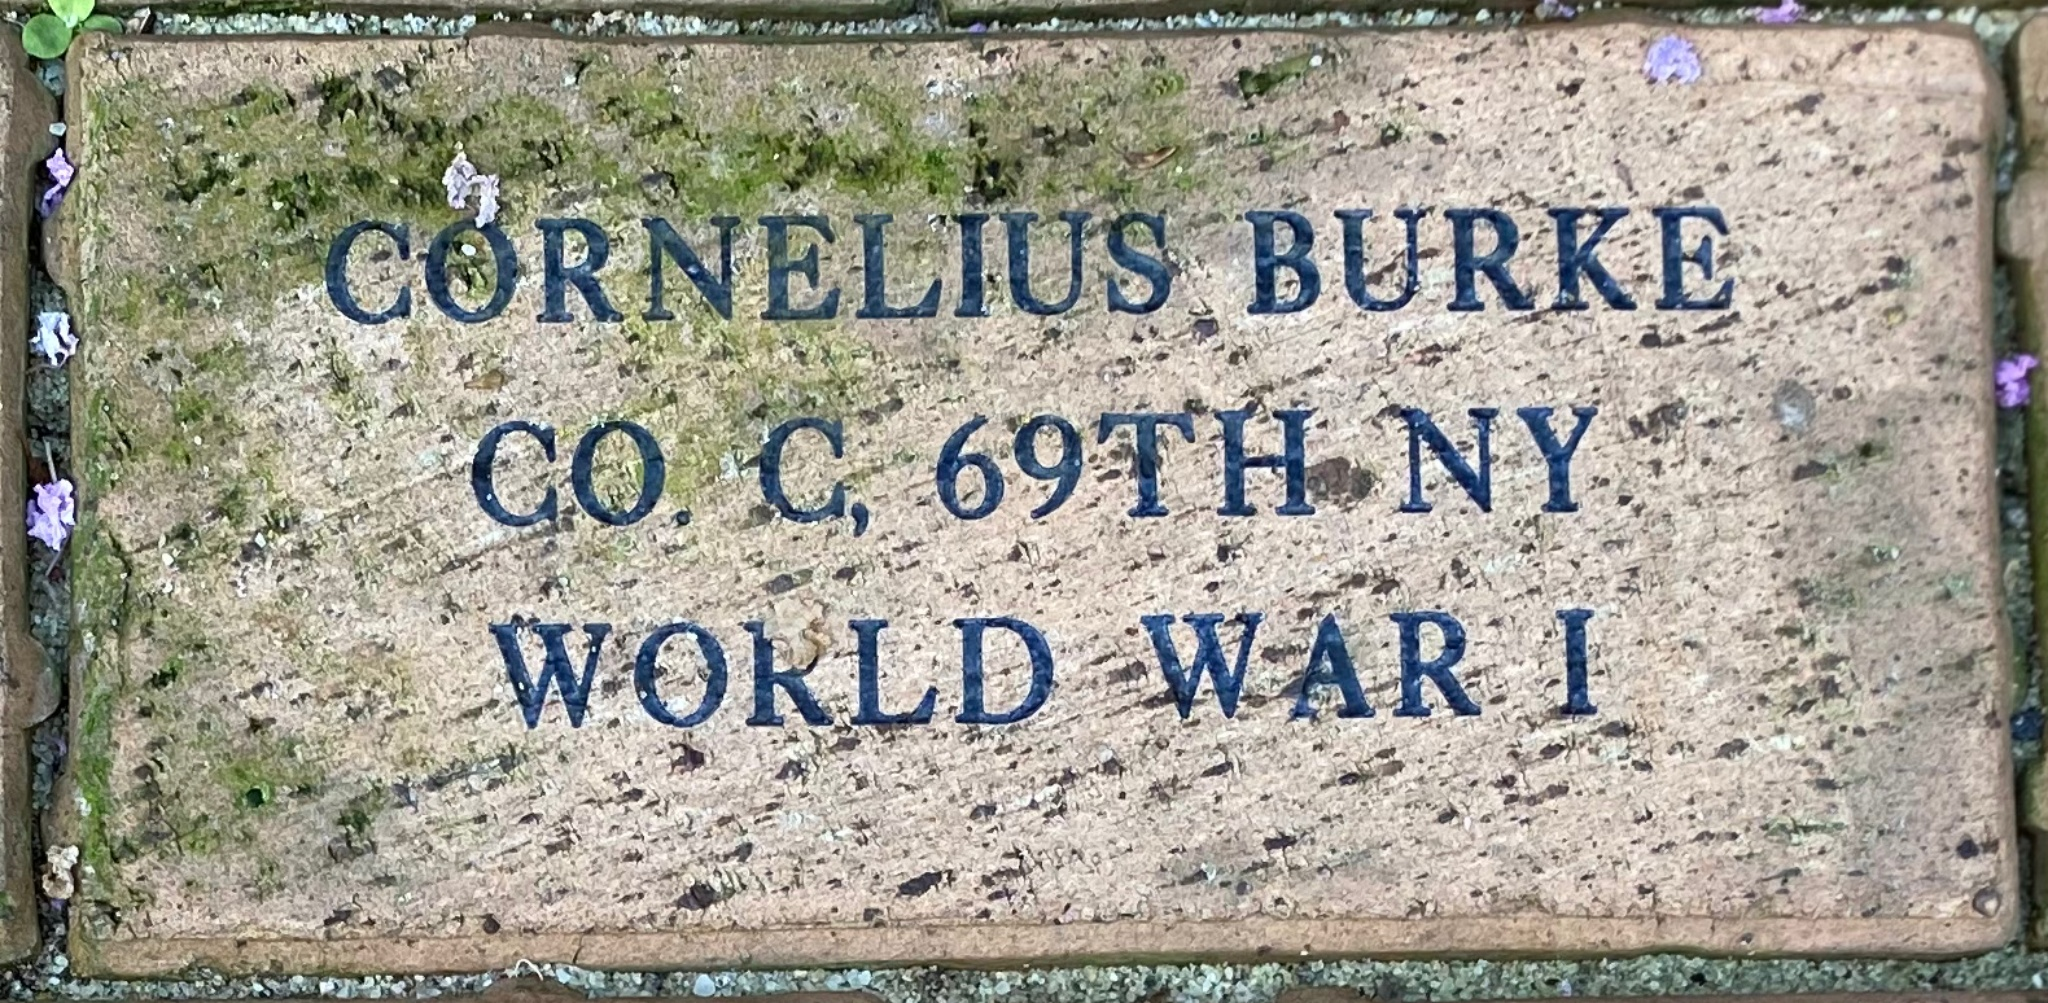 CORNELIUS BURKE CO. C, 69TH NY WORLD WAR I